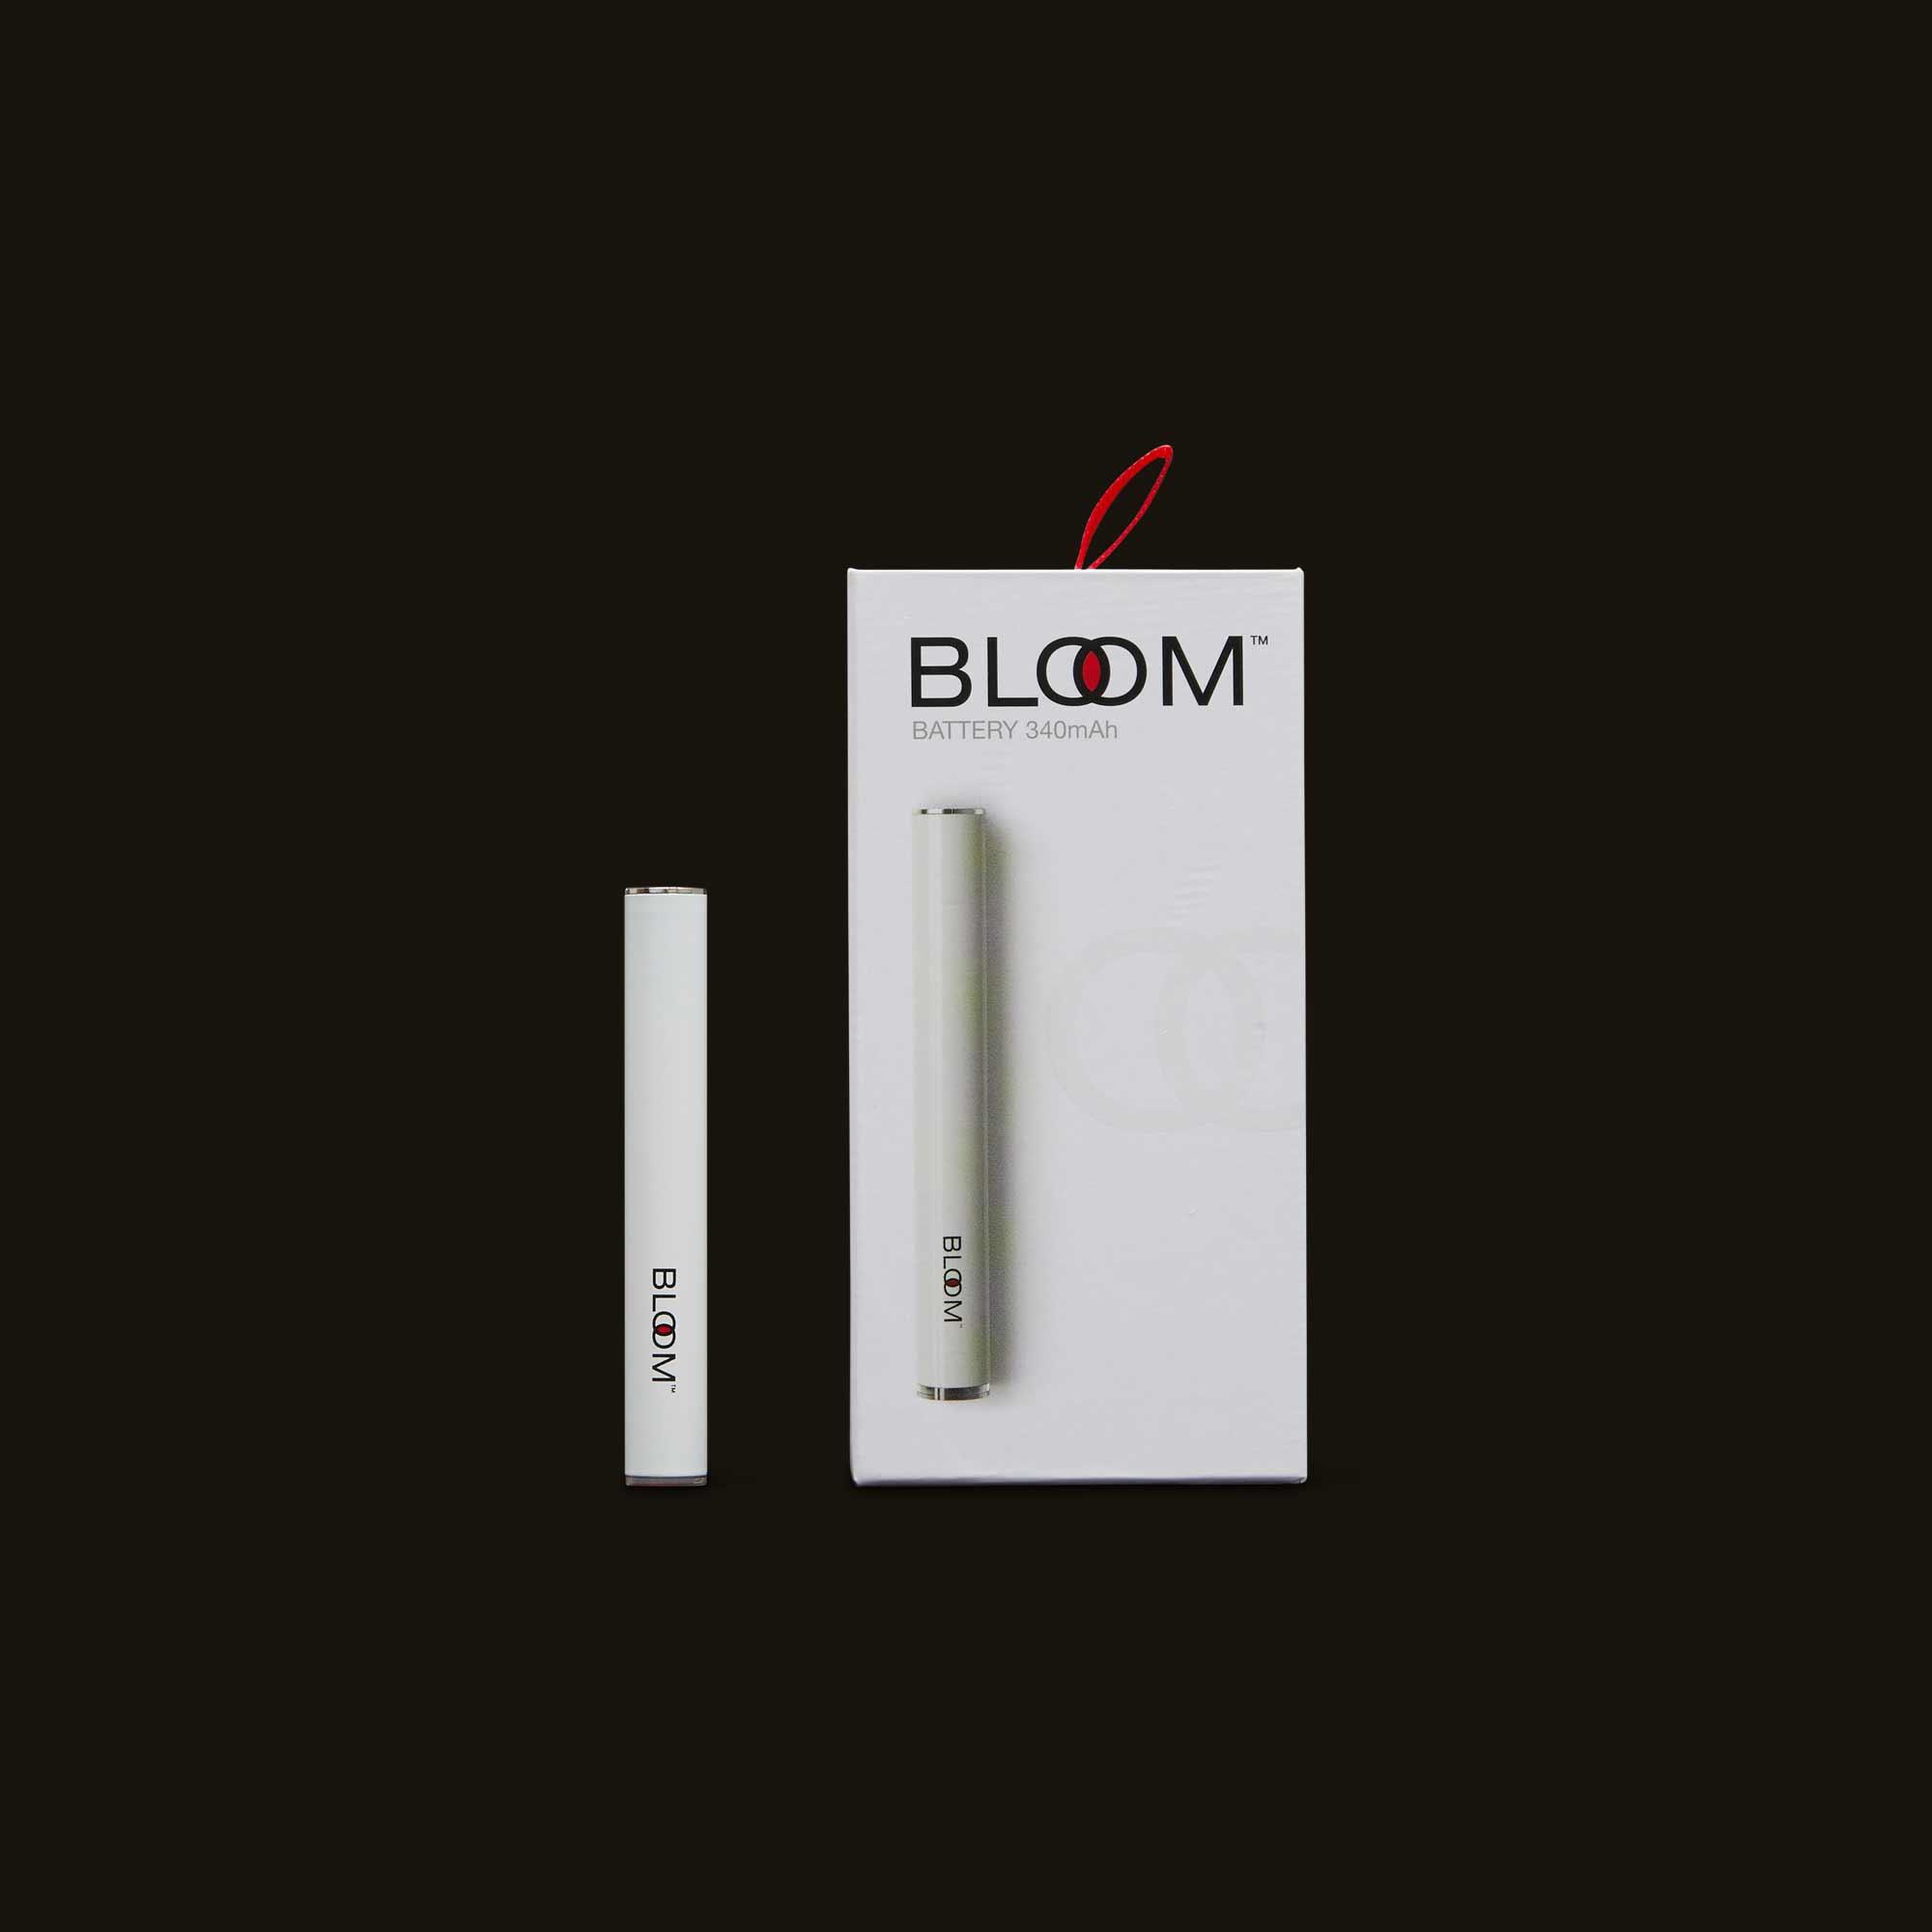 Bloom Brands 340mAh Battery